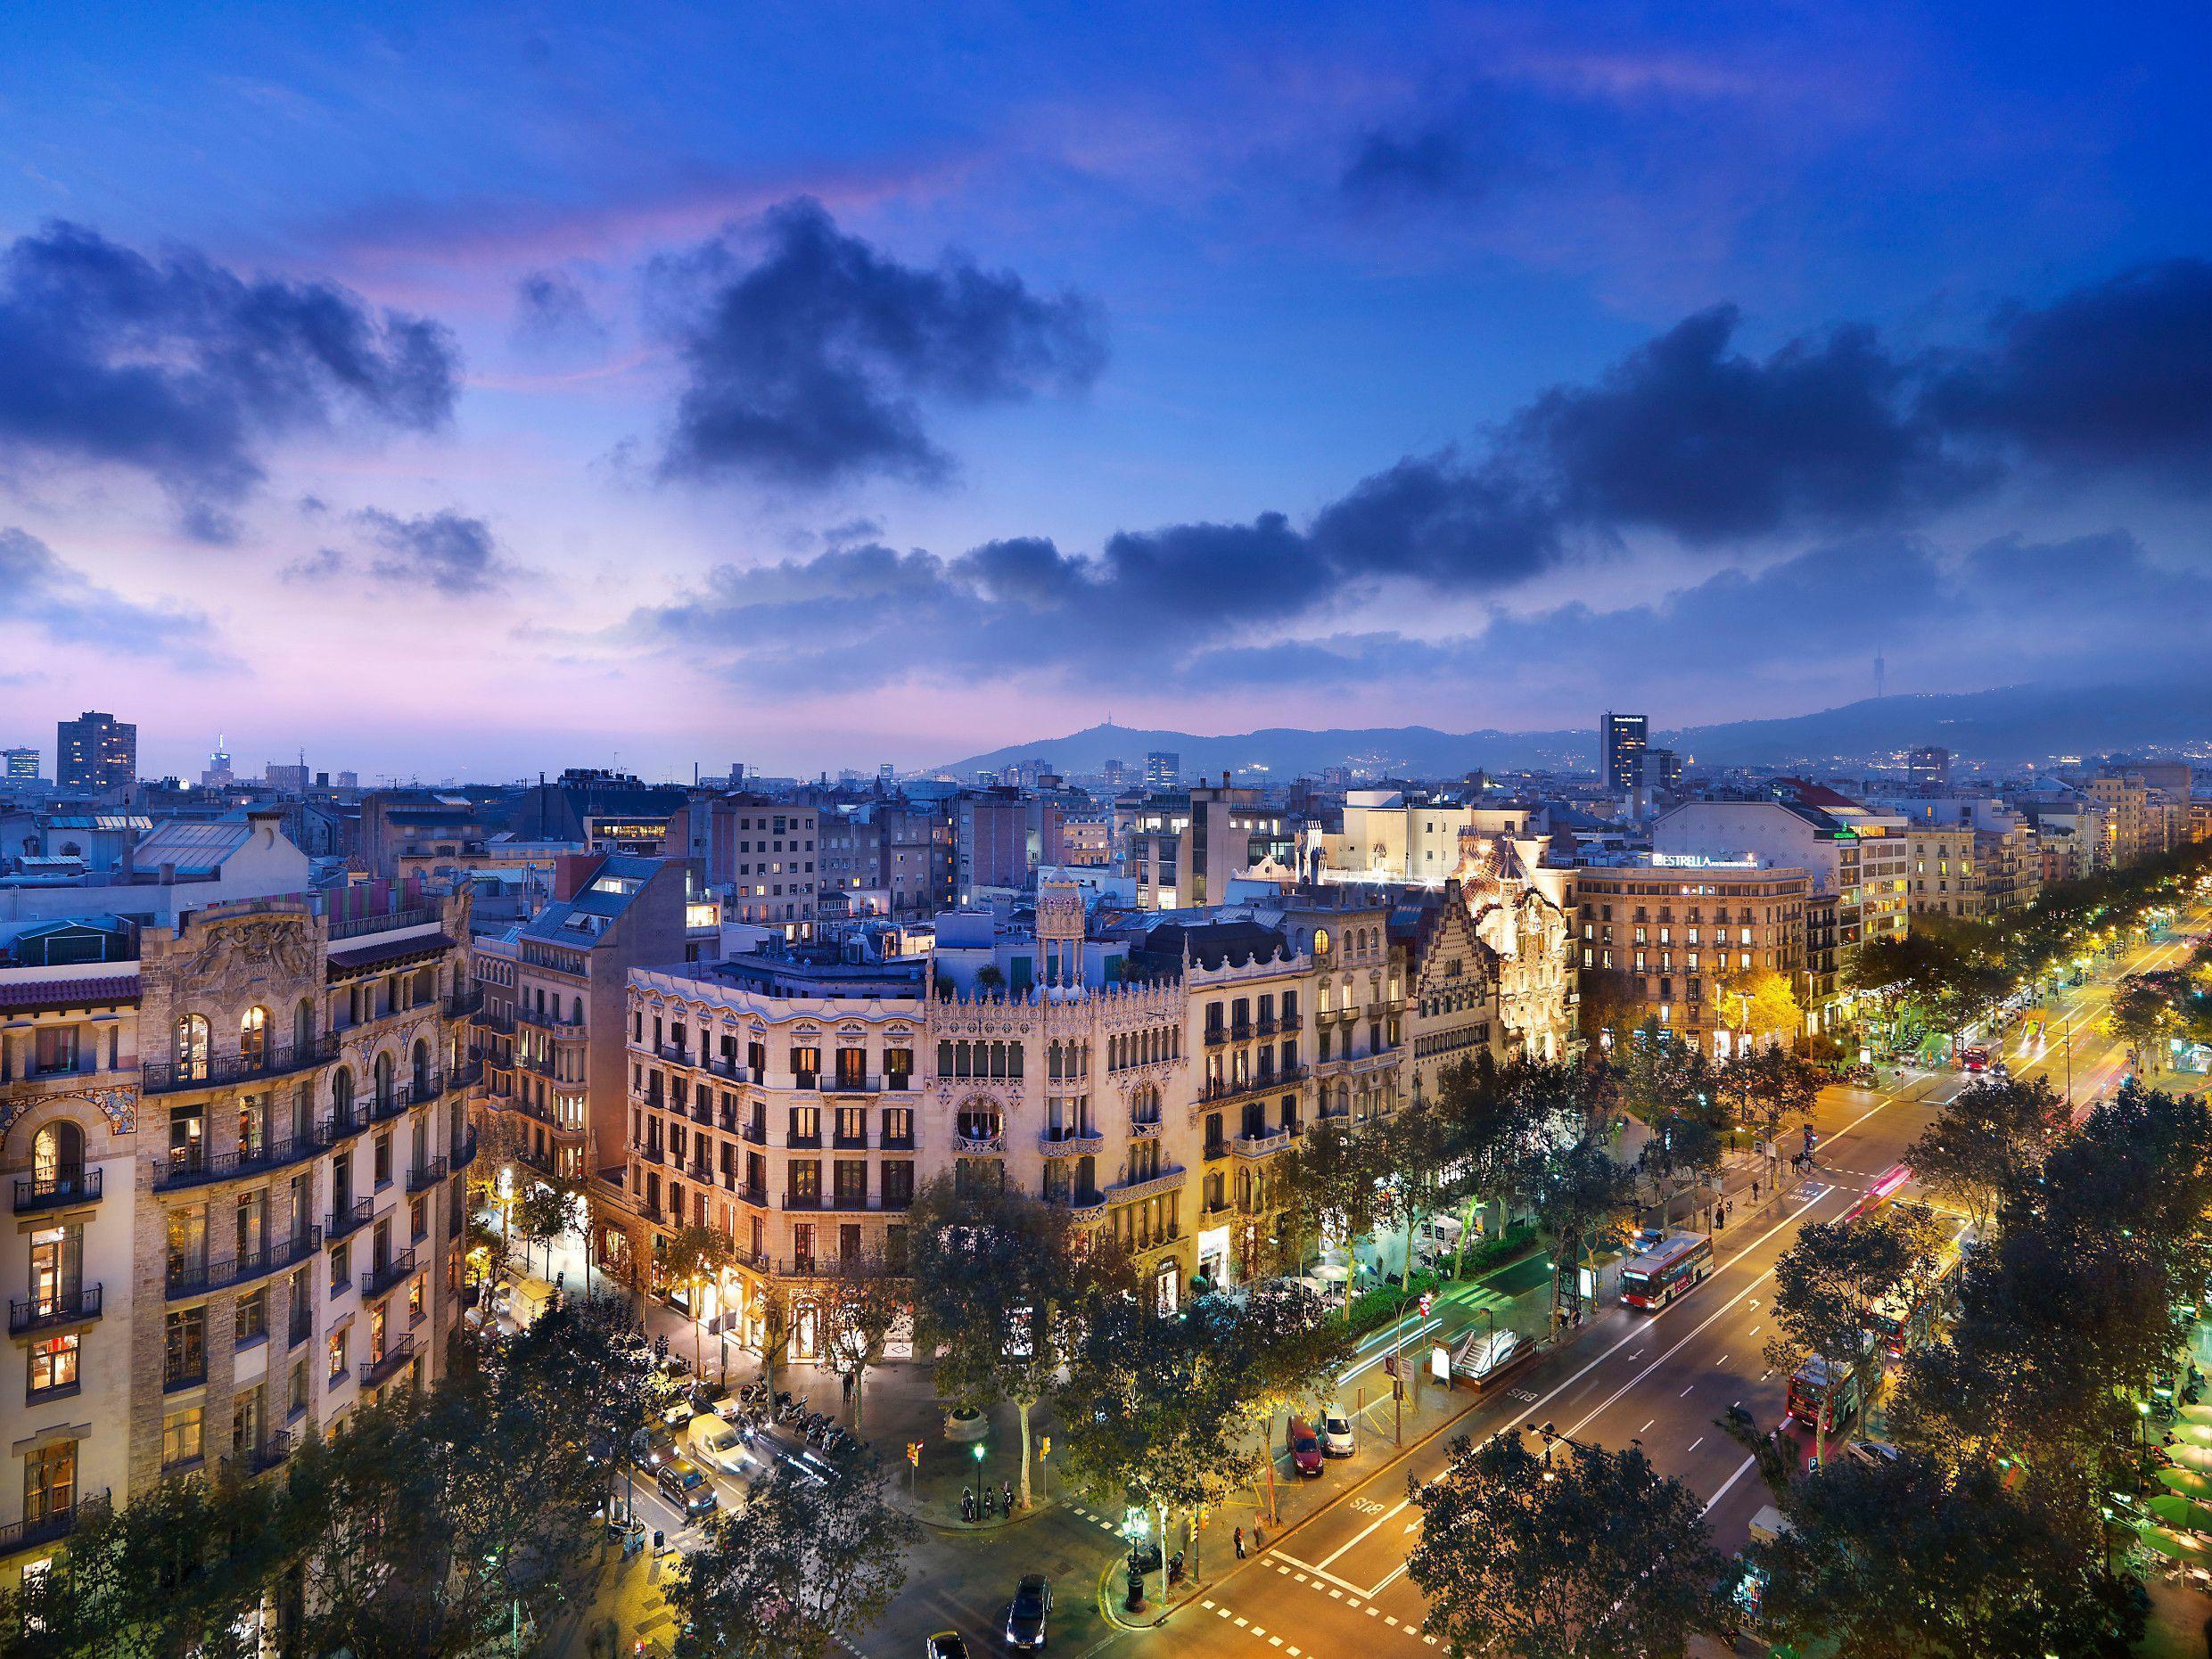 Barcelona At Night wallpaper – wallpaper free download